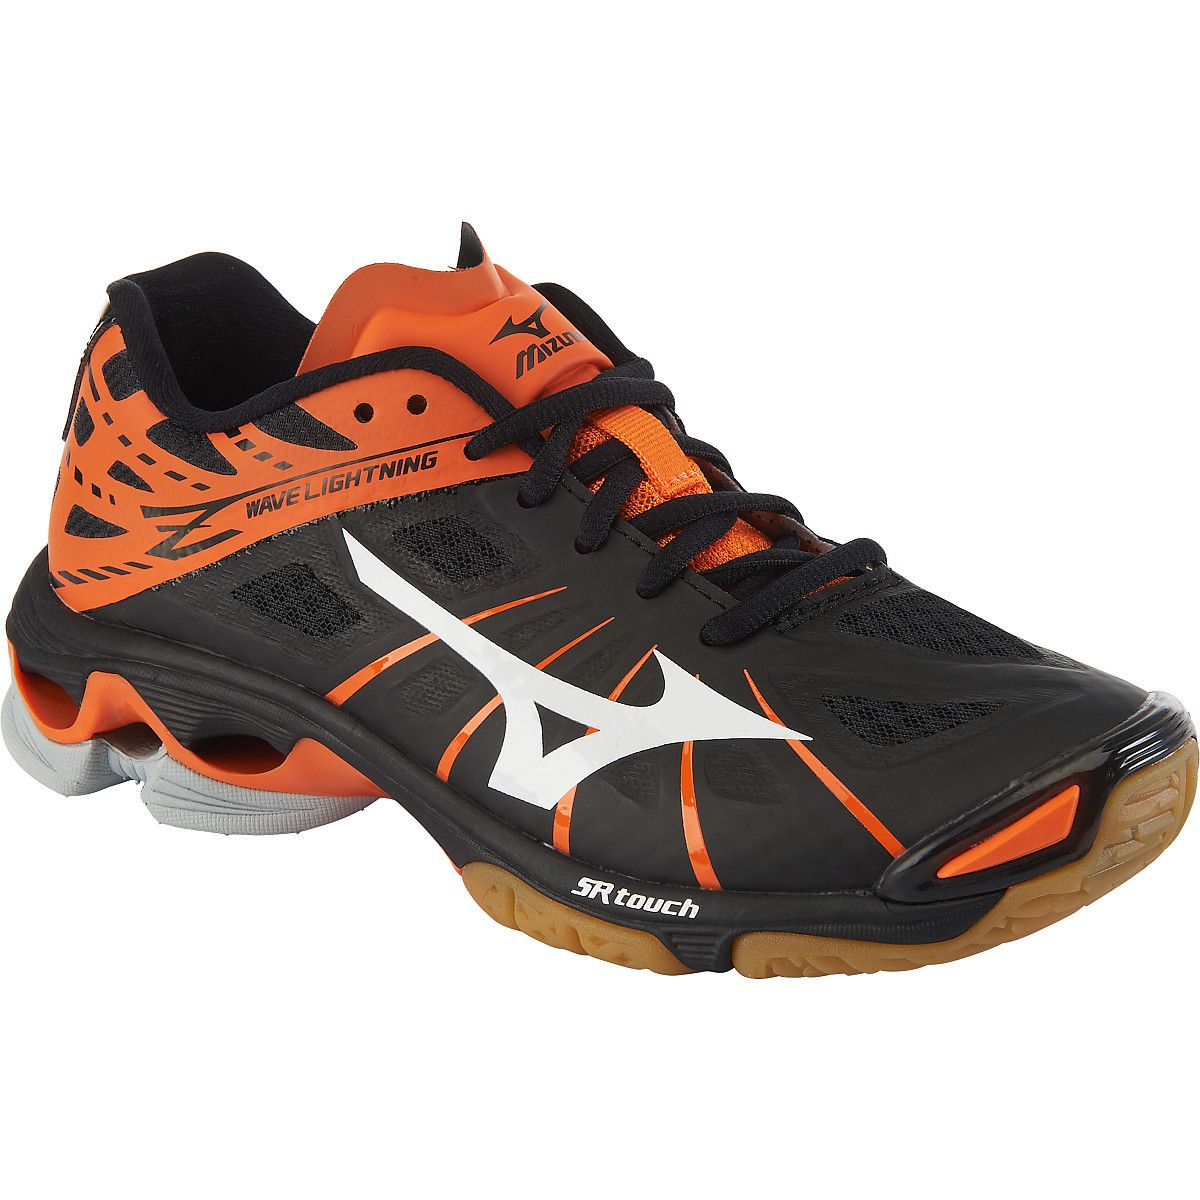 Mizuno Women S Wave Lightning Z Volleyball Shoes Volleyball Shoes Mizuno Shoes Badminton Shoes